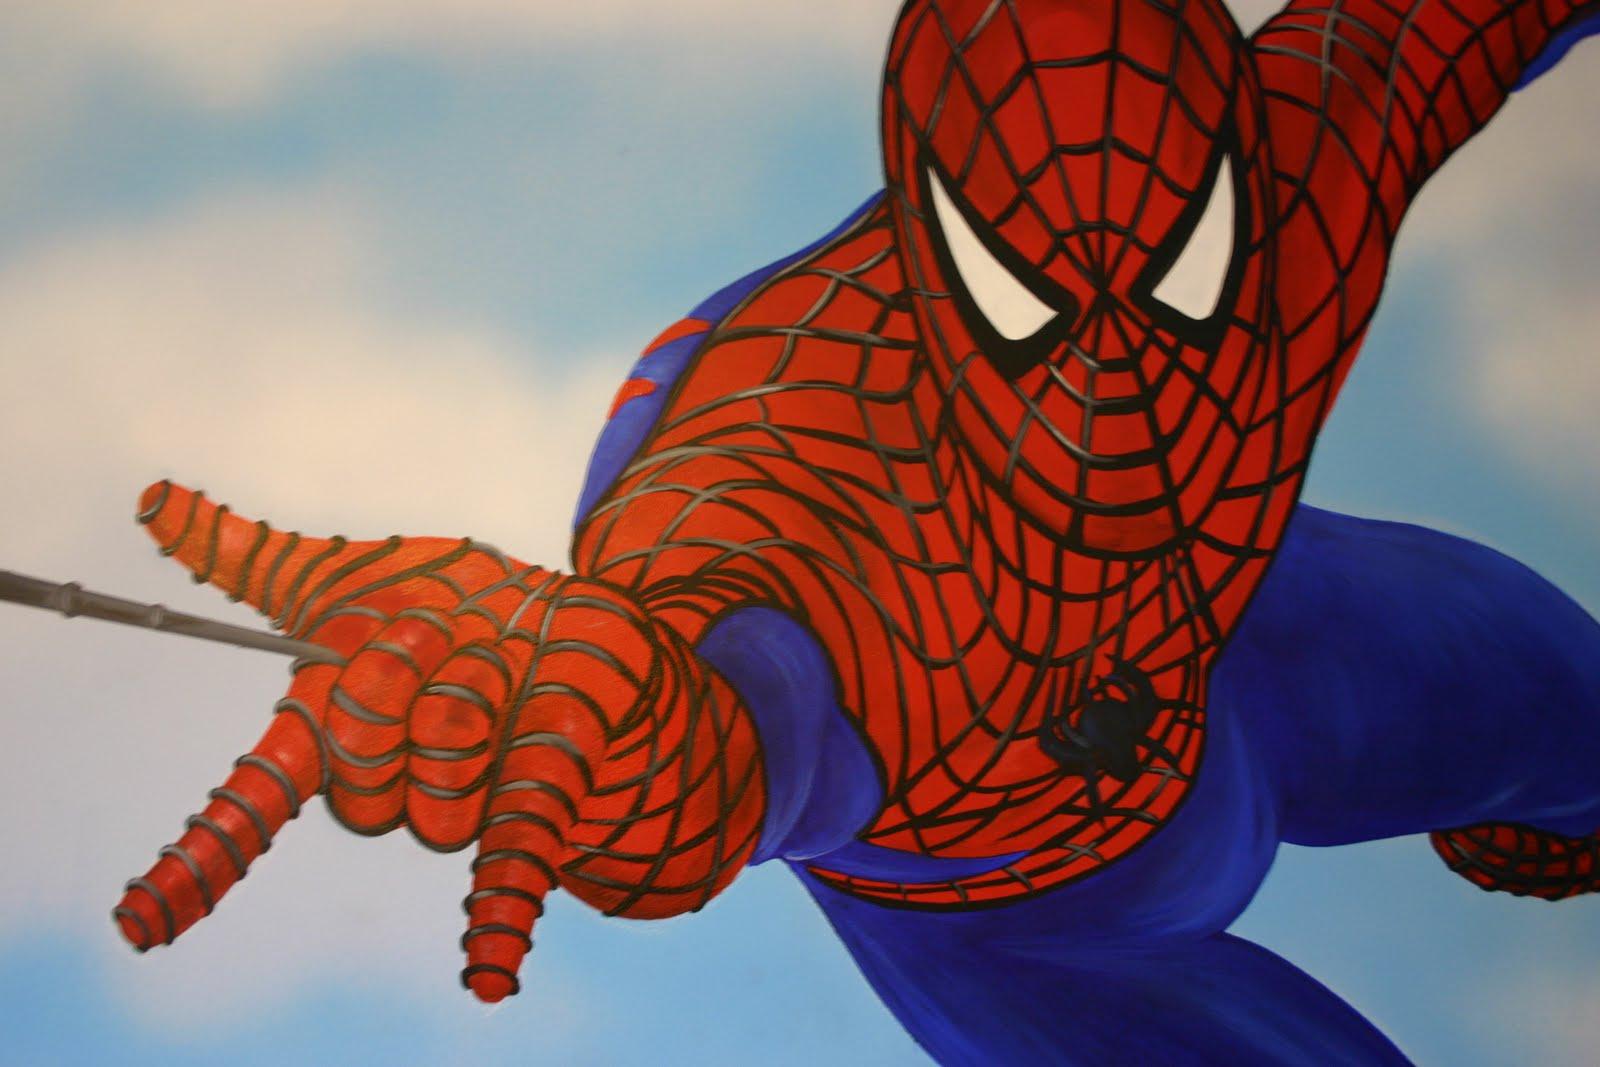 mural designs the muralist spiderman wall mural. Black Bedroom Furniture Sets. Home Design Ideas